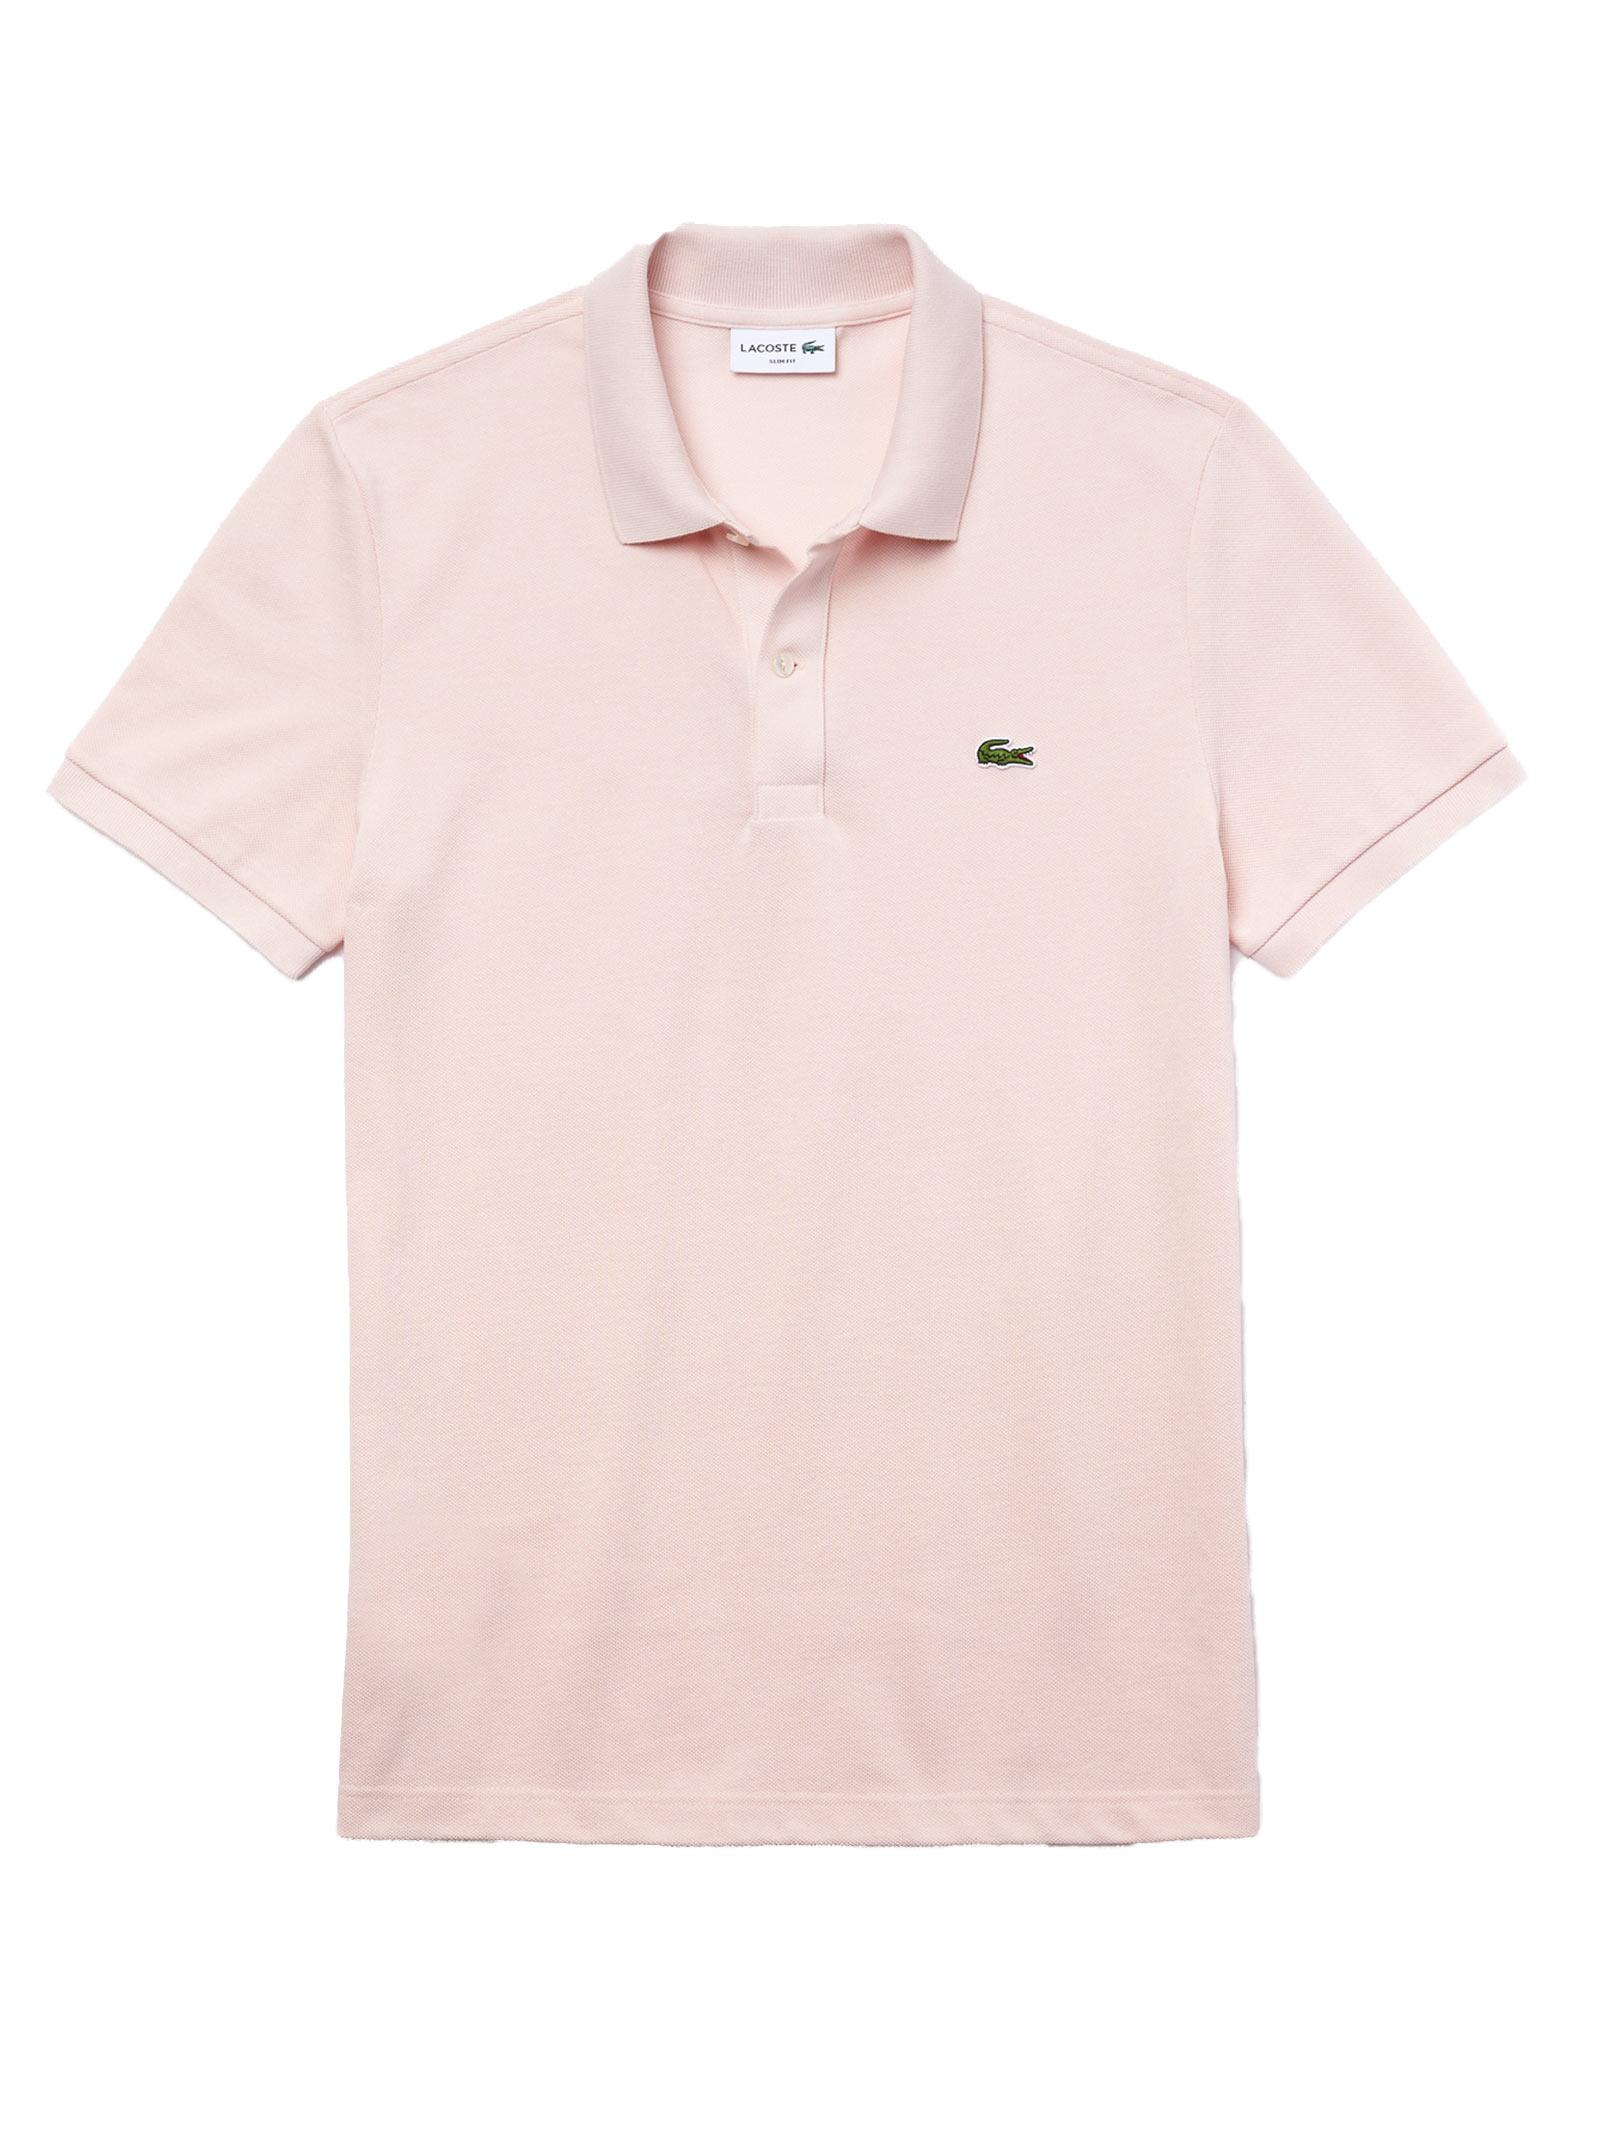 Polo  slim fit rosa LACOSTE   Polo   PH4012ADY